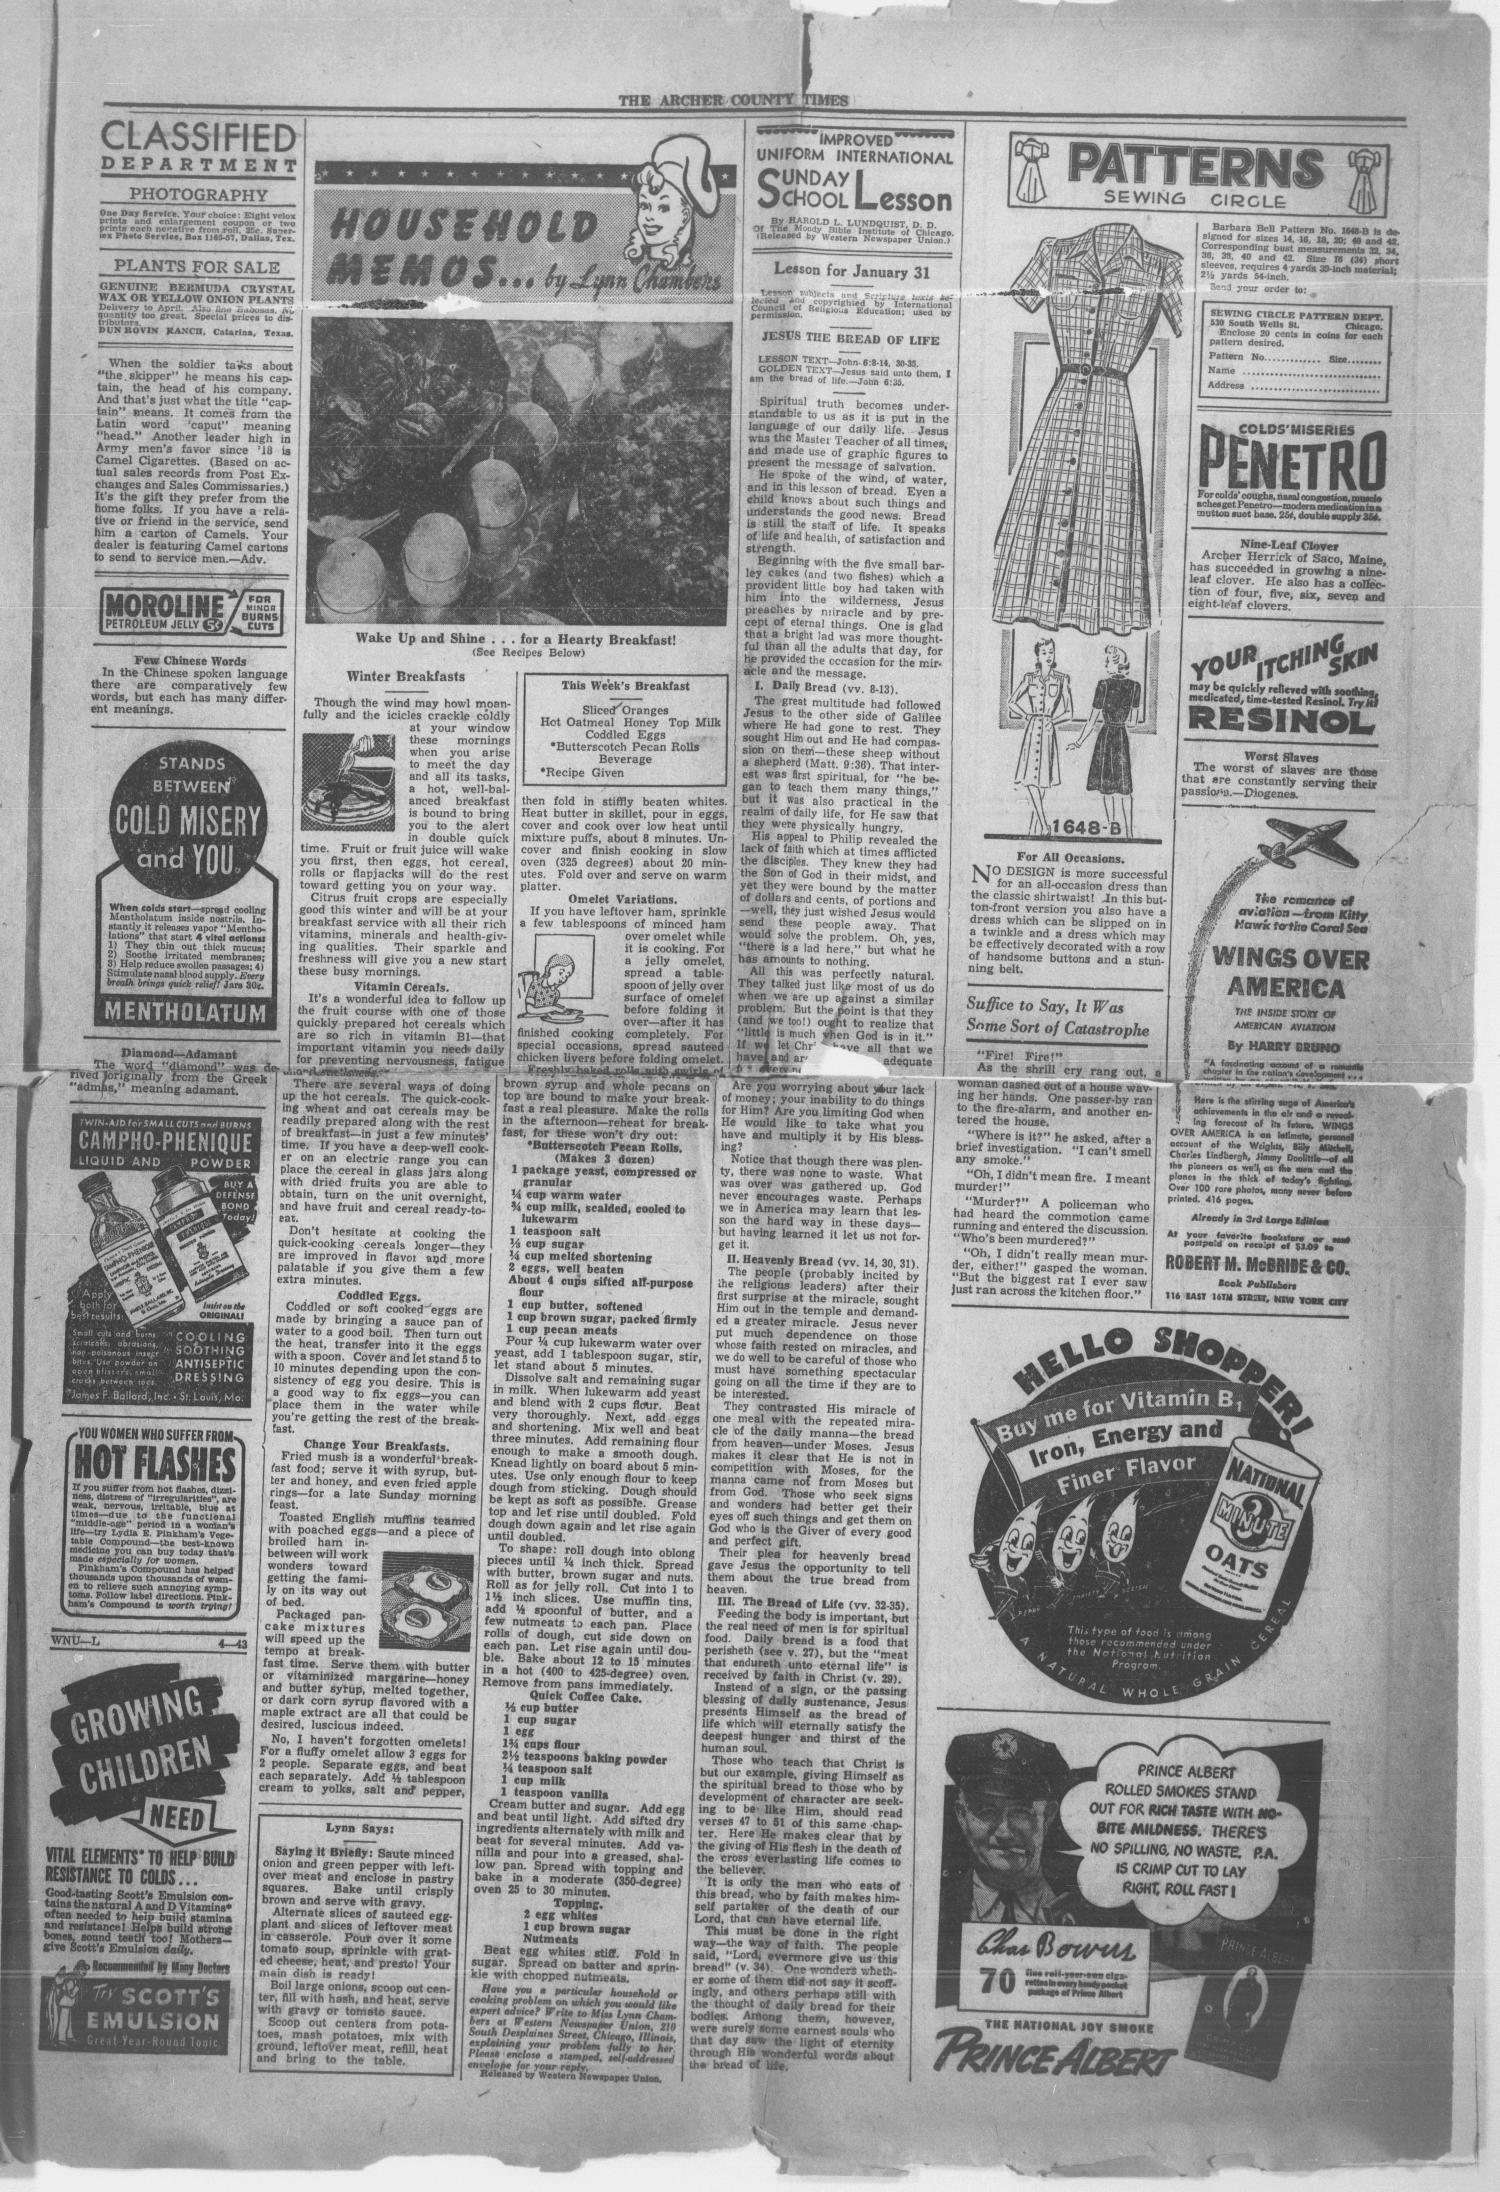 The Archer County Times (Archer City, Tex ), Vol  18, No  30